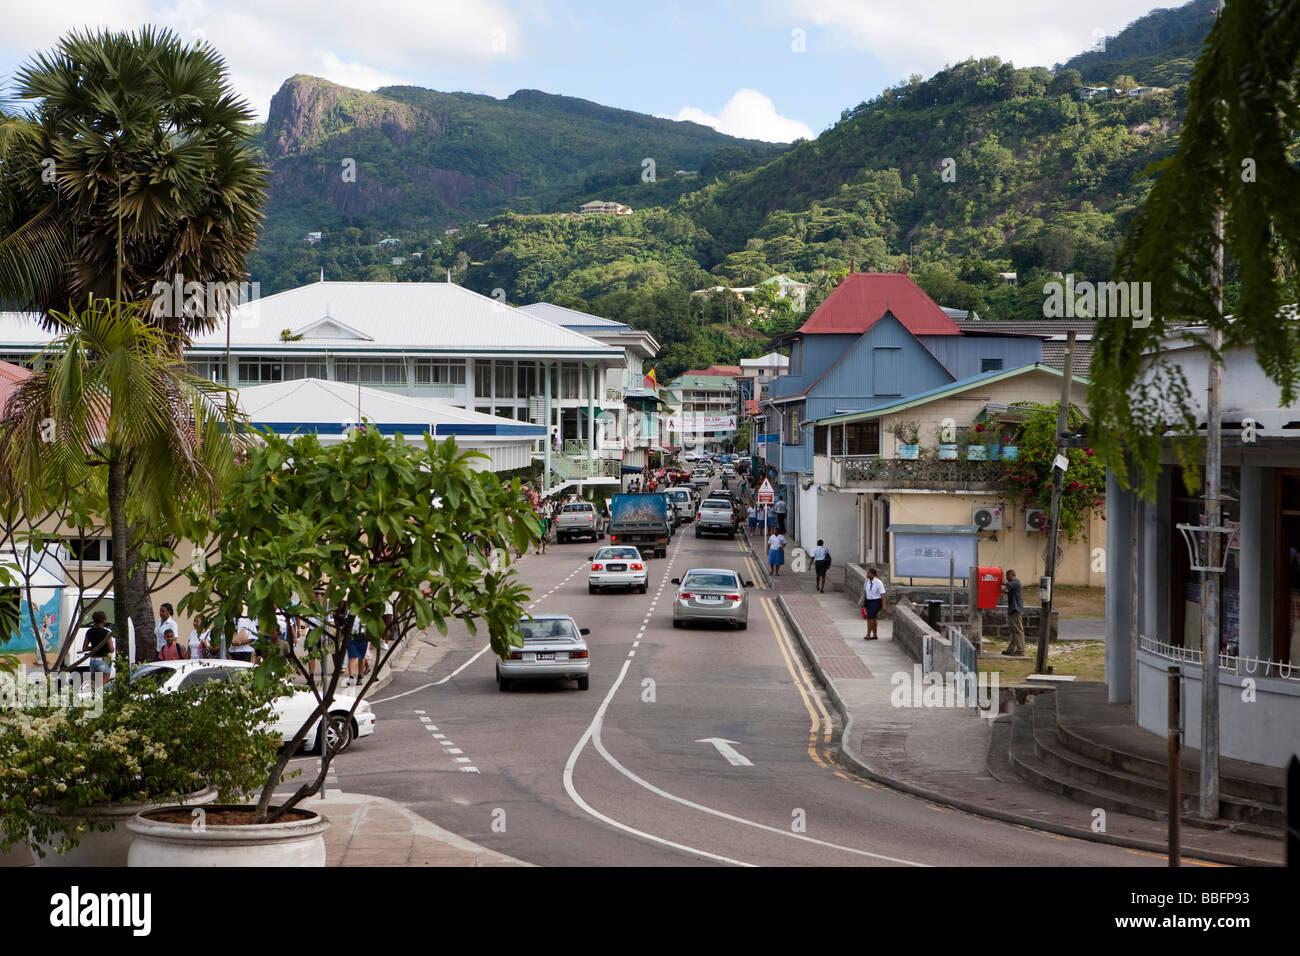 View of Albert Street, capital city Victoria, Mahe Island, Seychelles, Indian Ocean, Africa - Stock Image